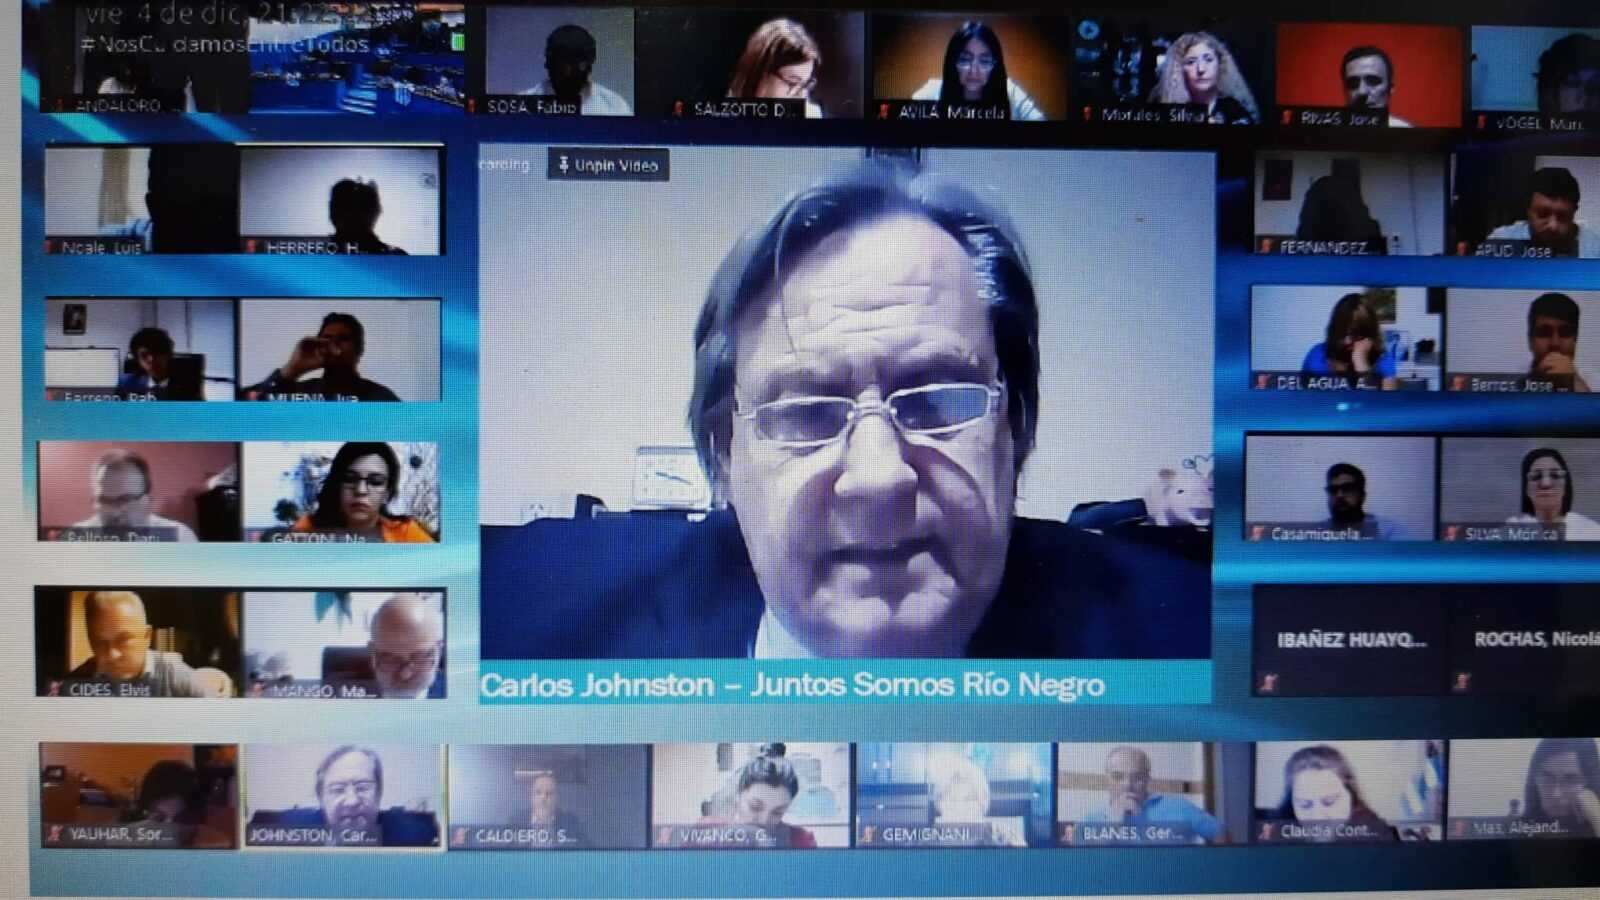 johsnton sesion online - Catriel25Noticias.com